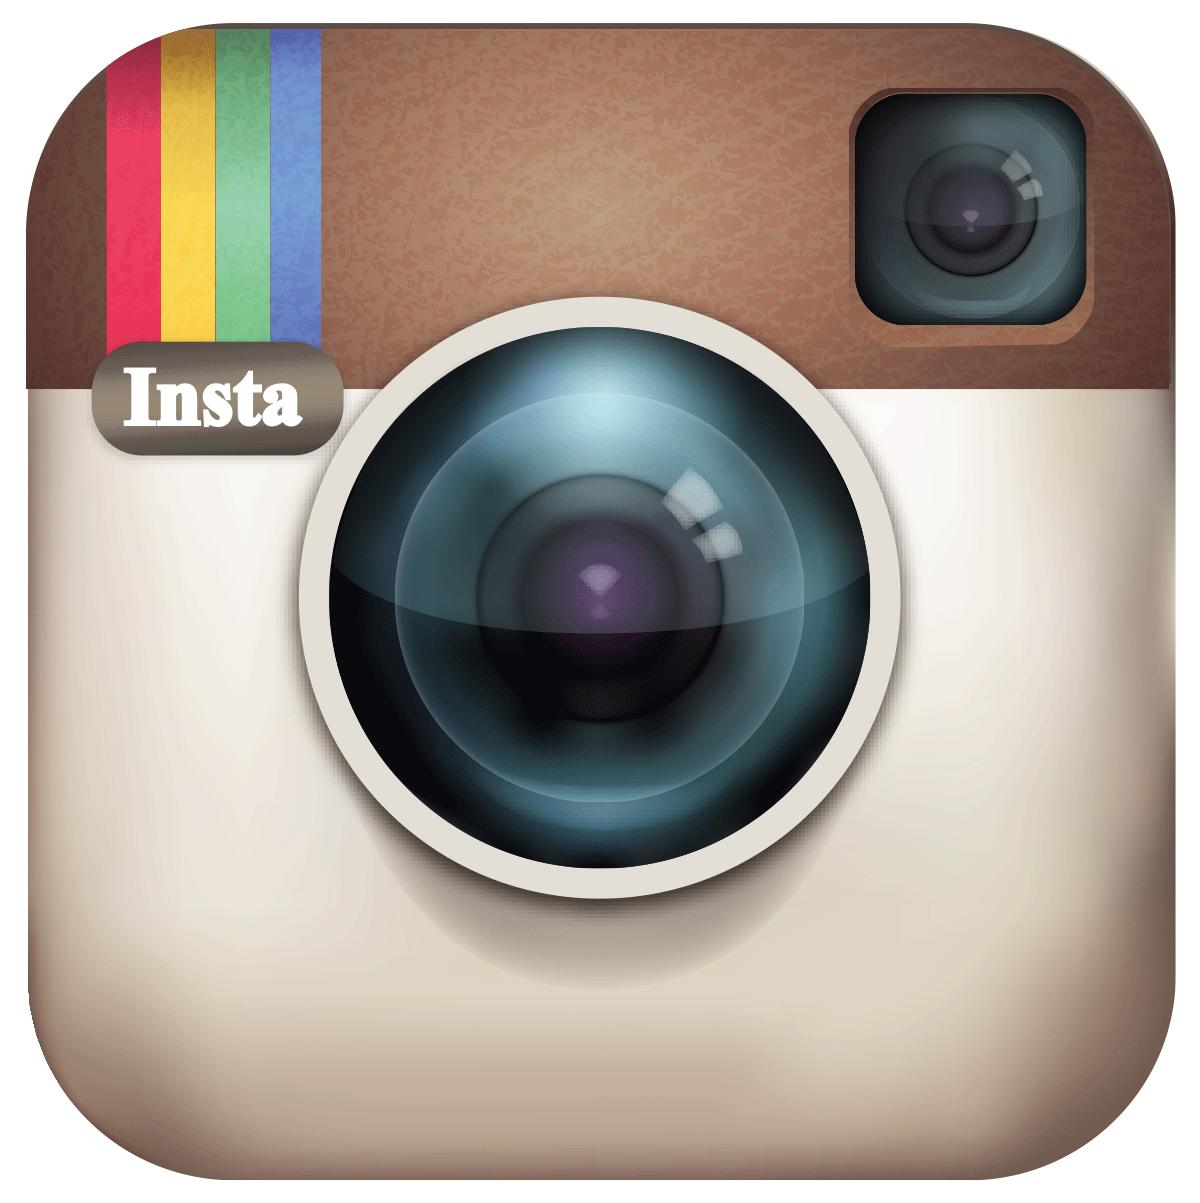 1200x1203 Instagram Logo, Icon, Instagram Gif, Transparent Png [2018]